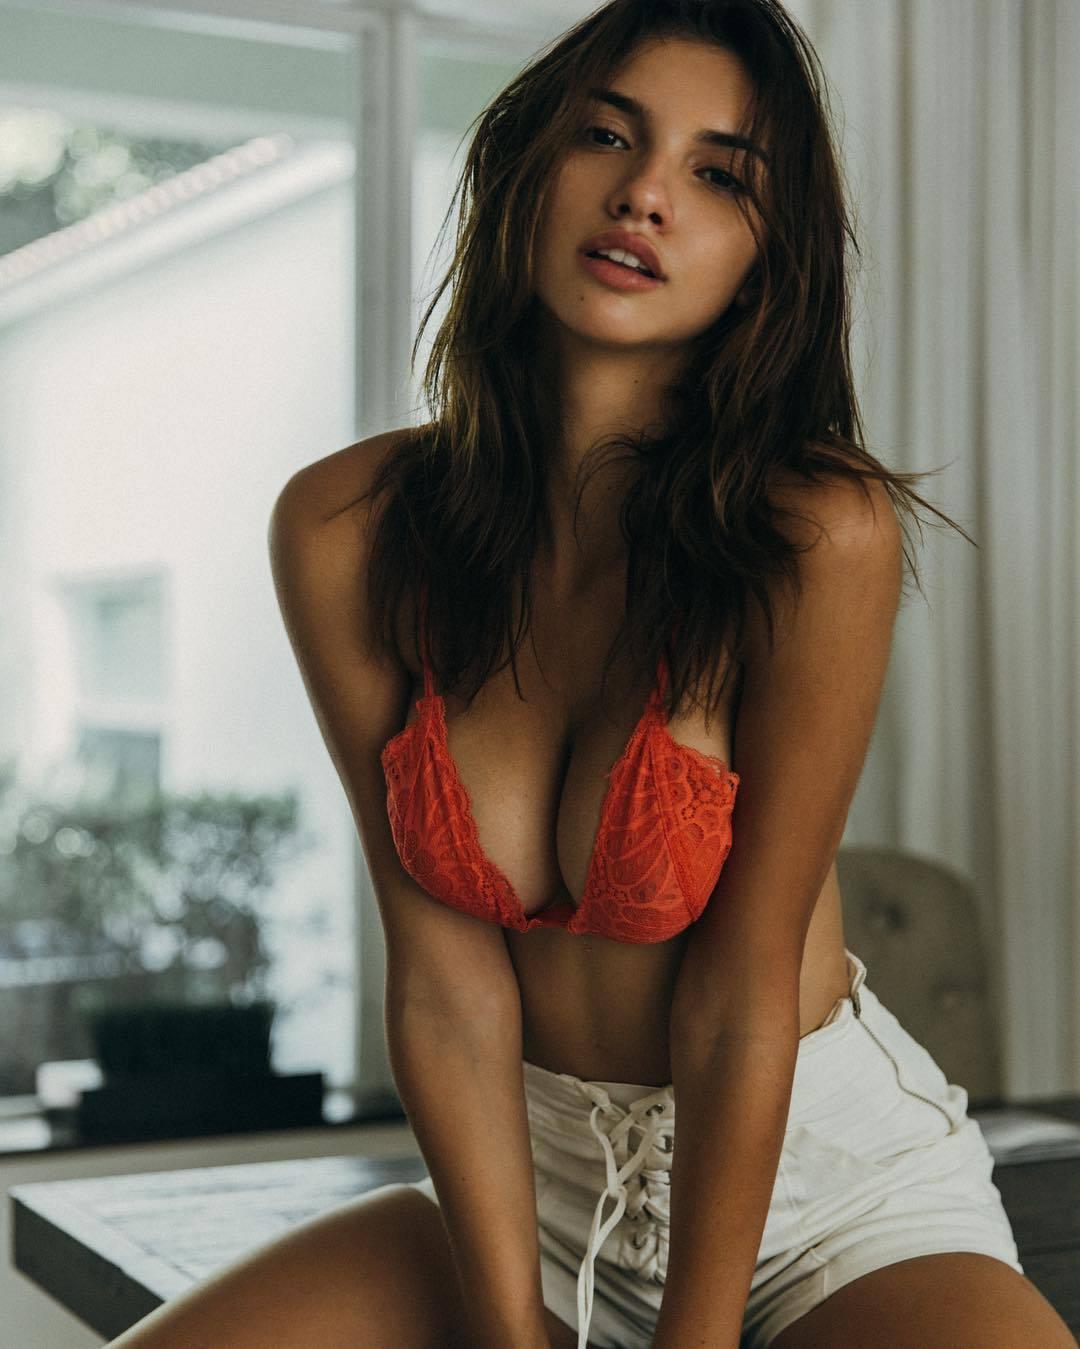 Bikini Chanel Postrel nudes (79 foto and video), Topless, Leaked, Twitter, braless 2015